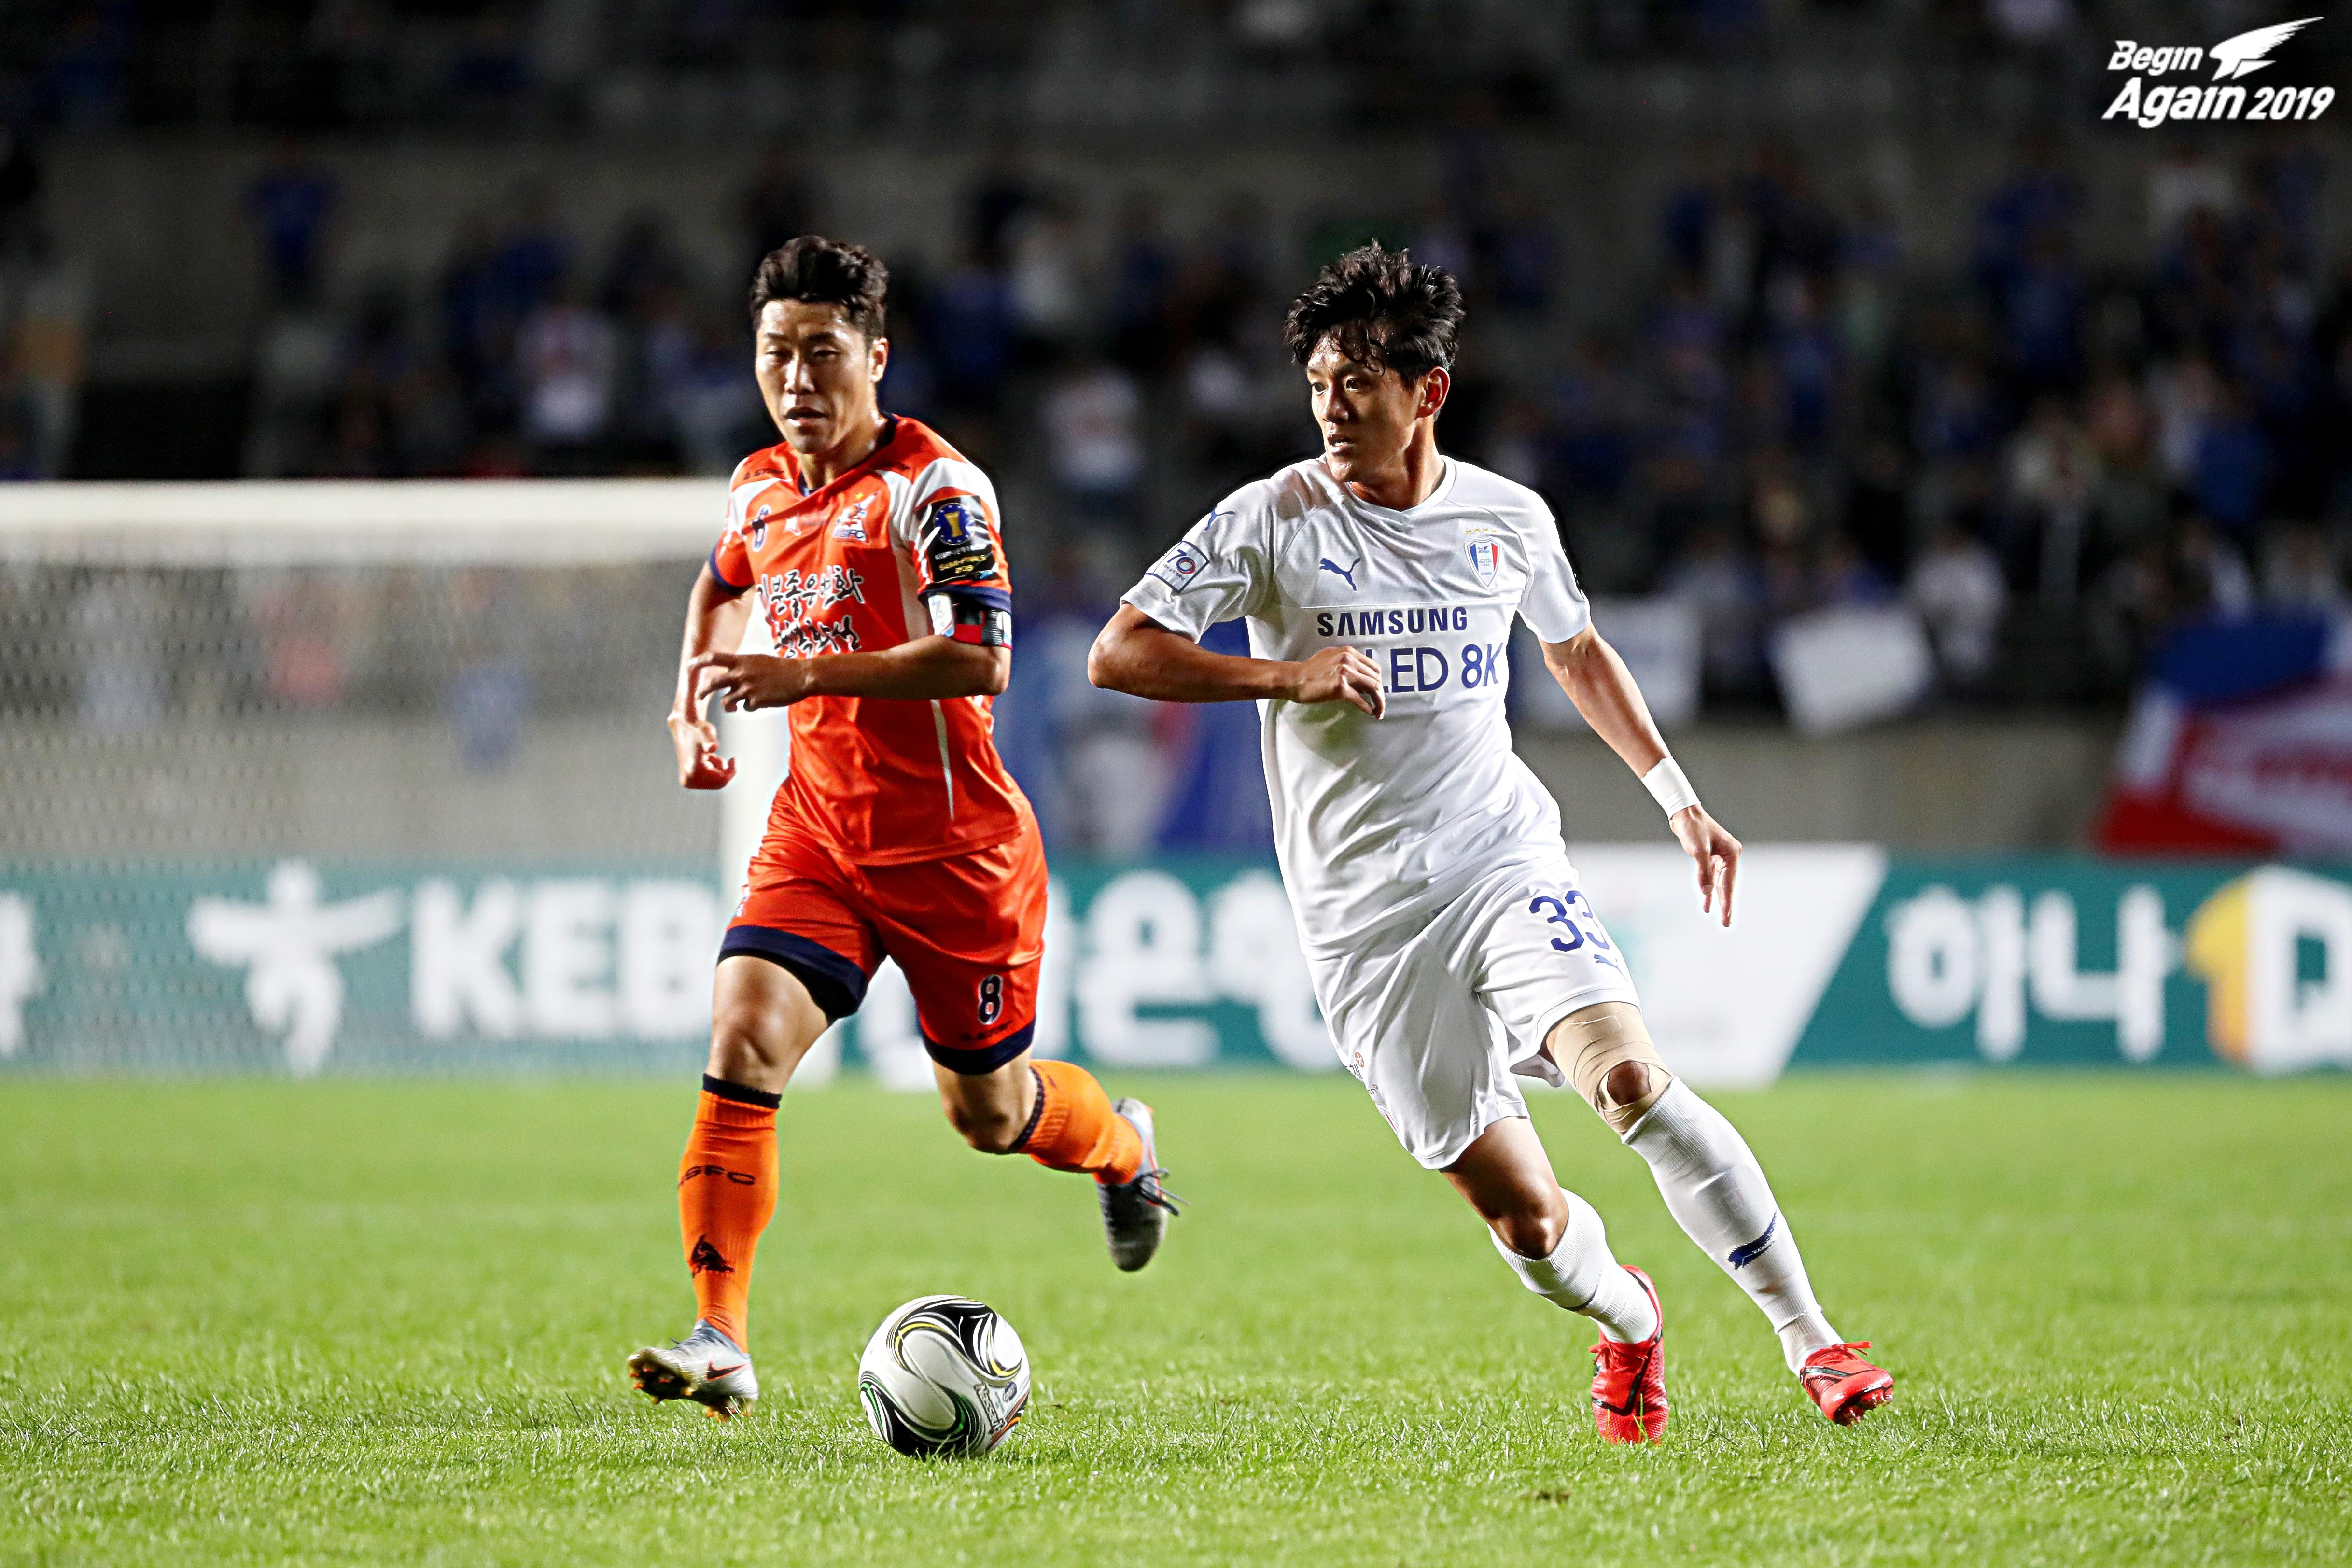 2019-0919-FA컵-화성전-0047.jpg